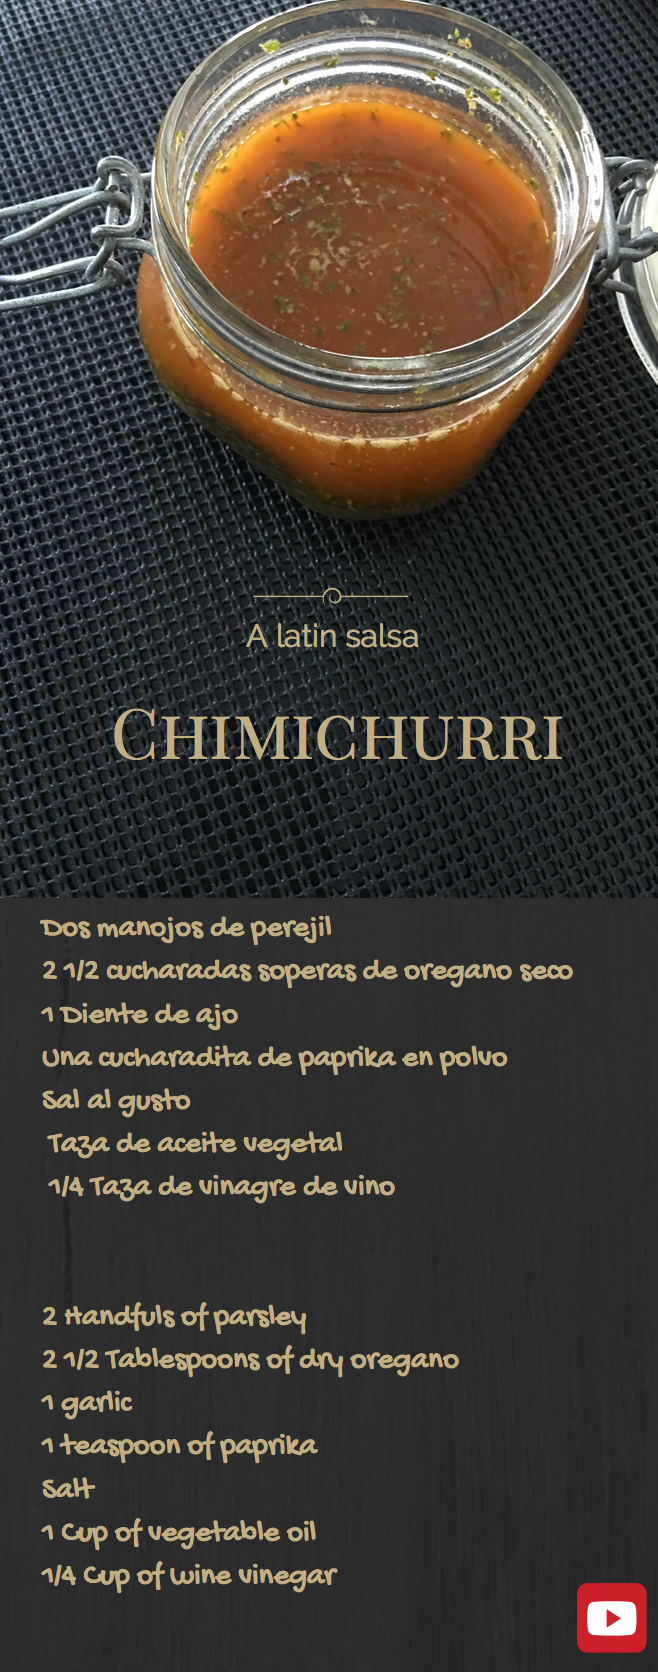 Chimichurri - ingredientes